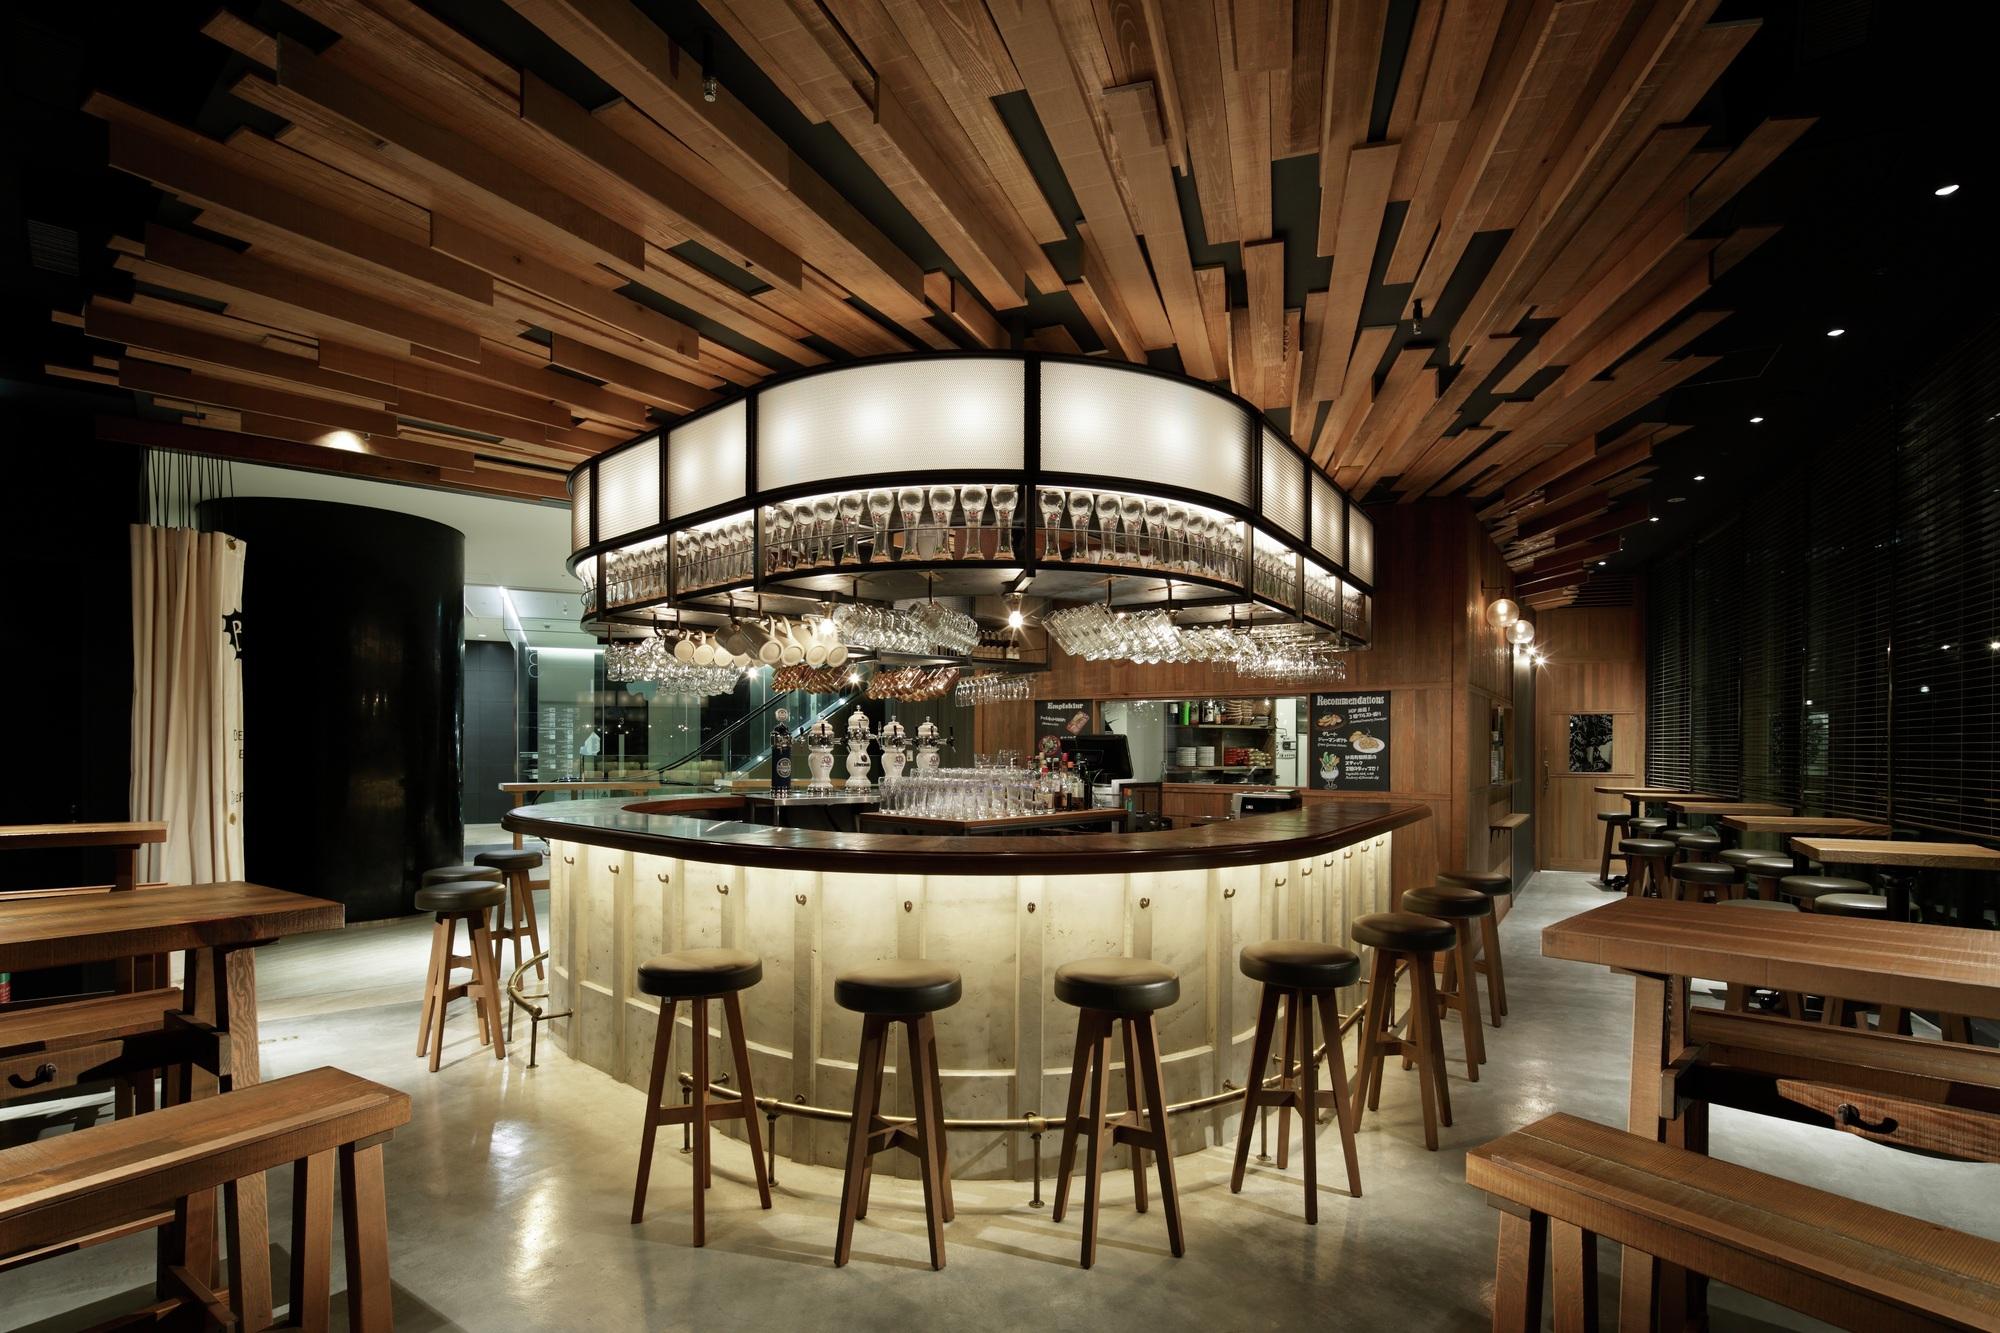 image courtesy of the restaurant u0026 bar design awards GNWEKWG